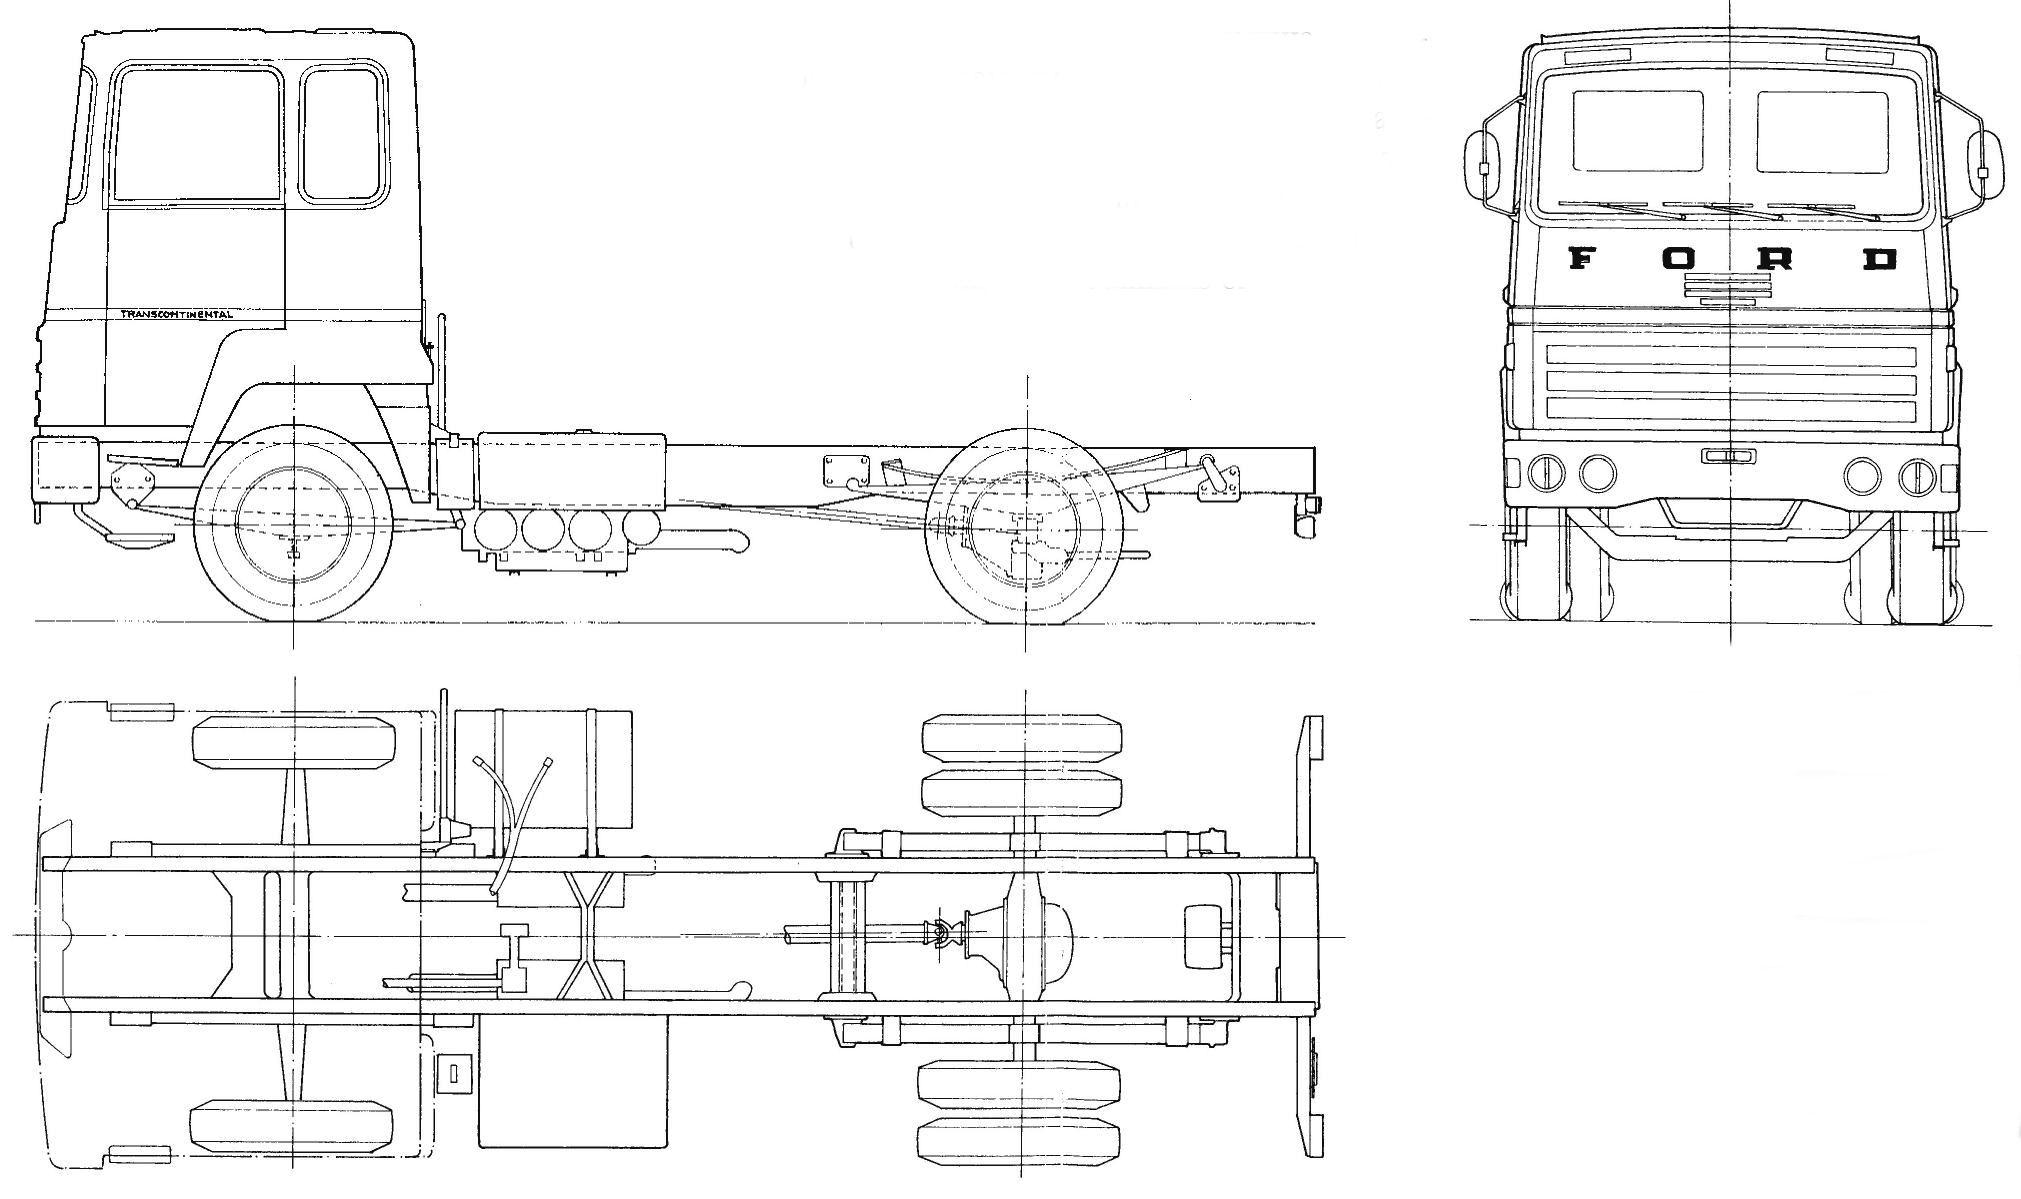 Ford Transcontinental blueprint